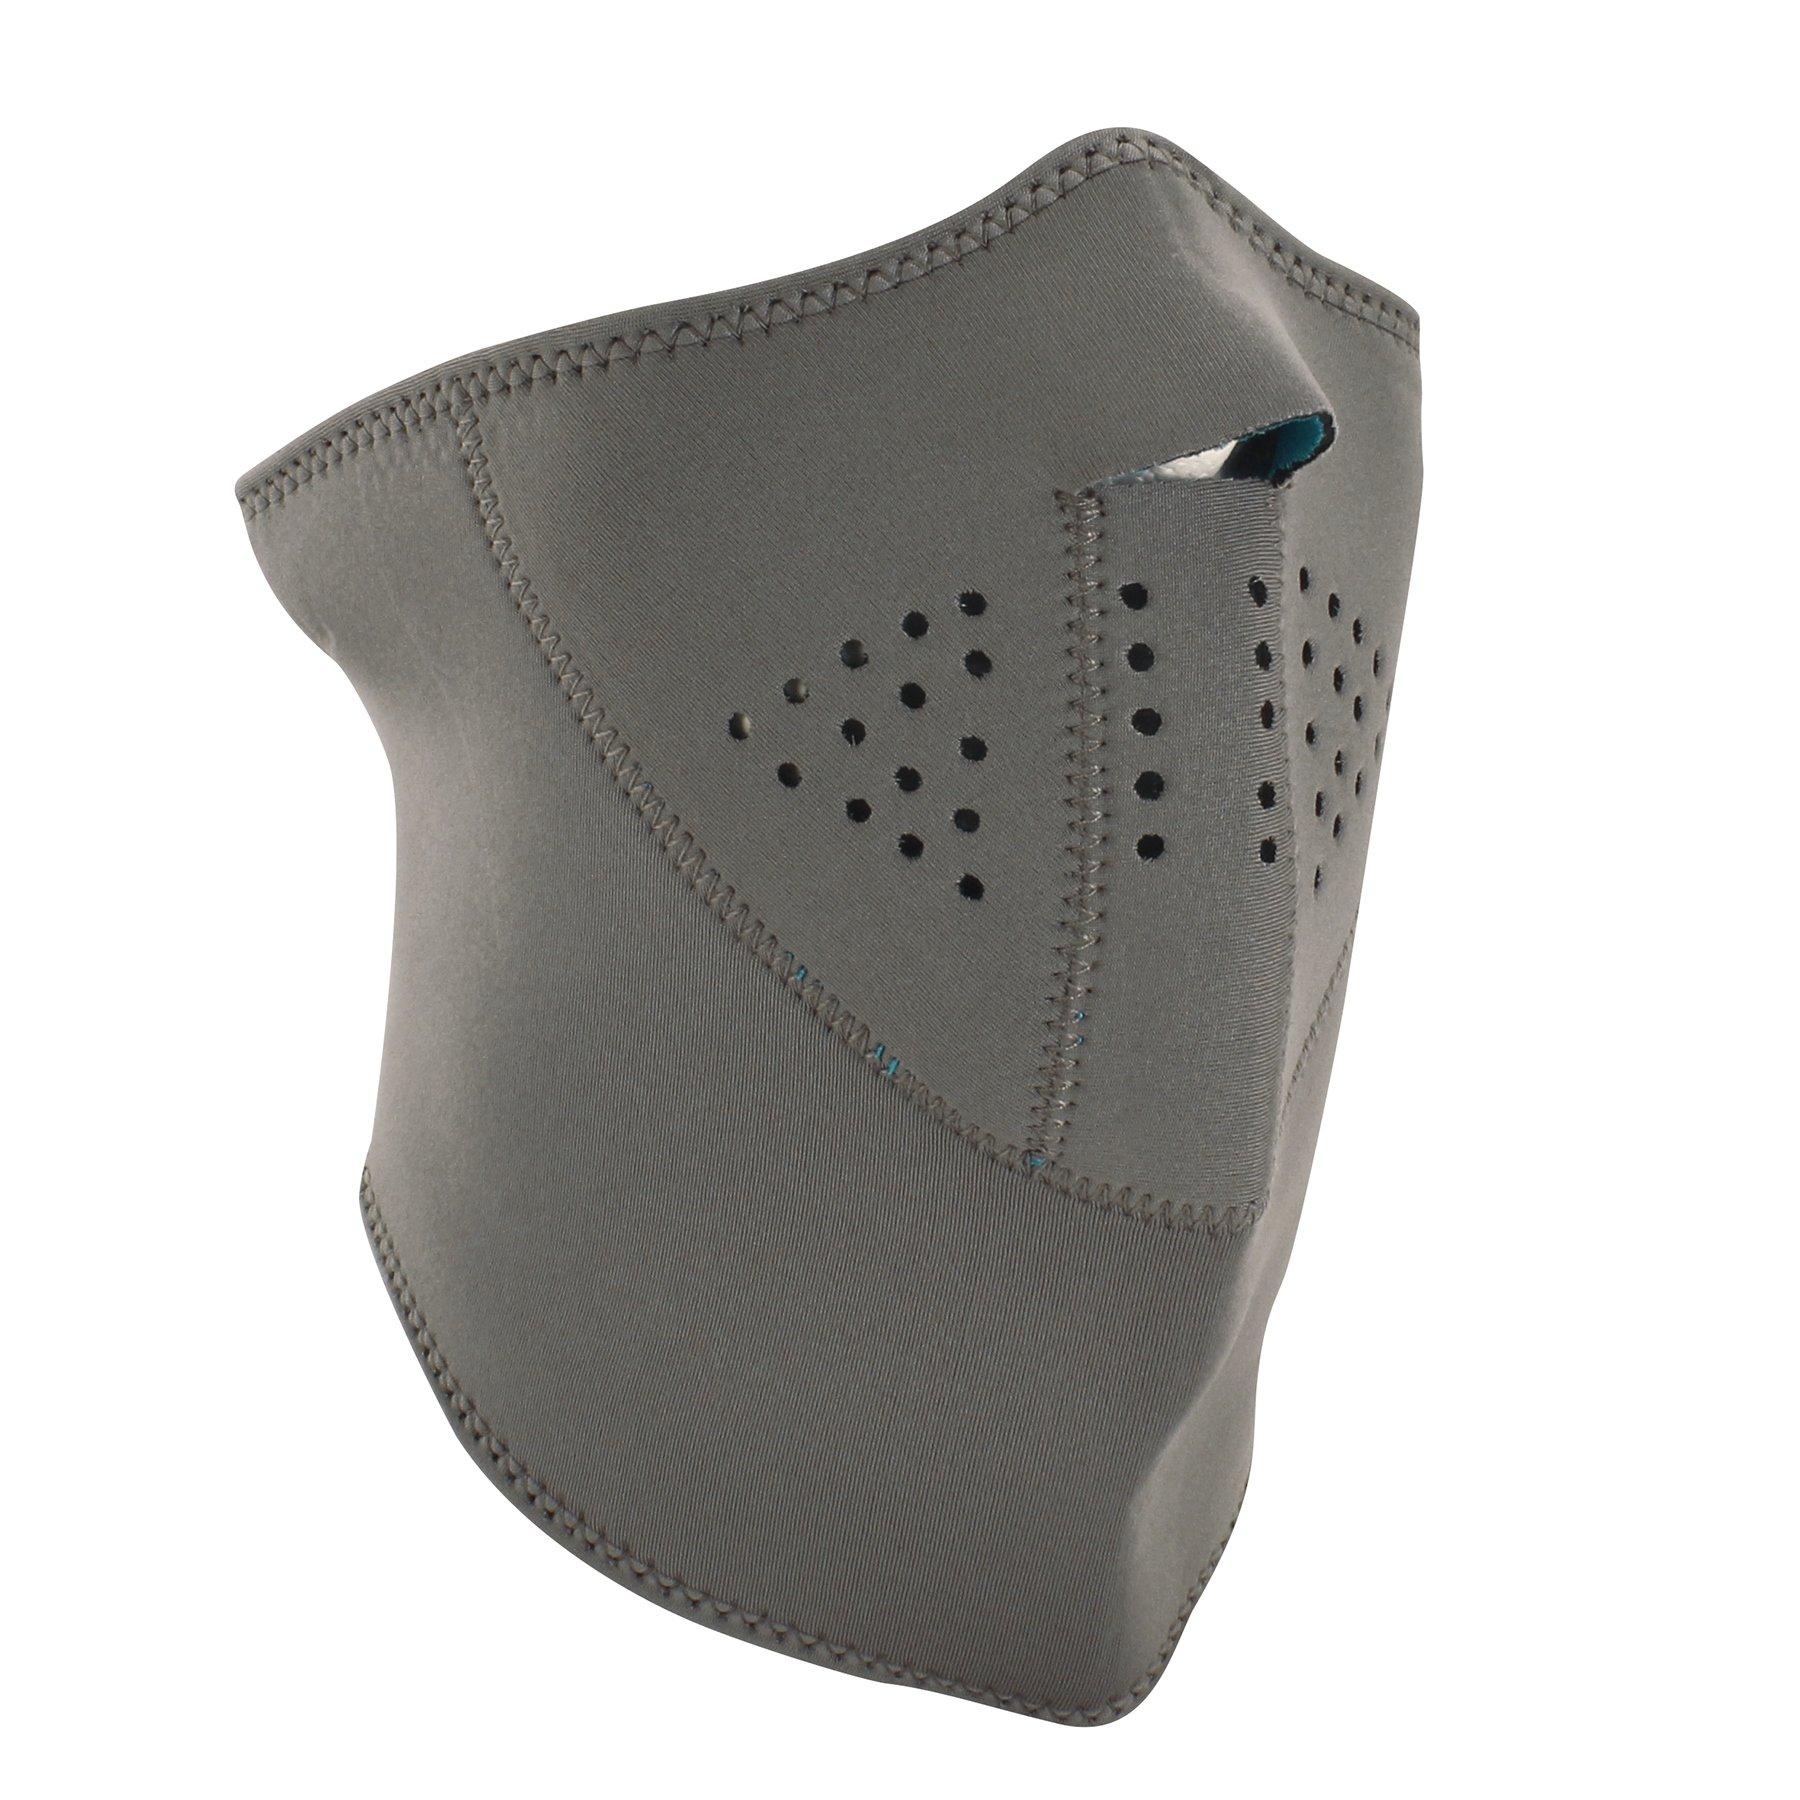 ZANheadgear 3-Panel Neoprene Half Face Mask, Gray Reverses to Teal